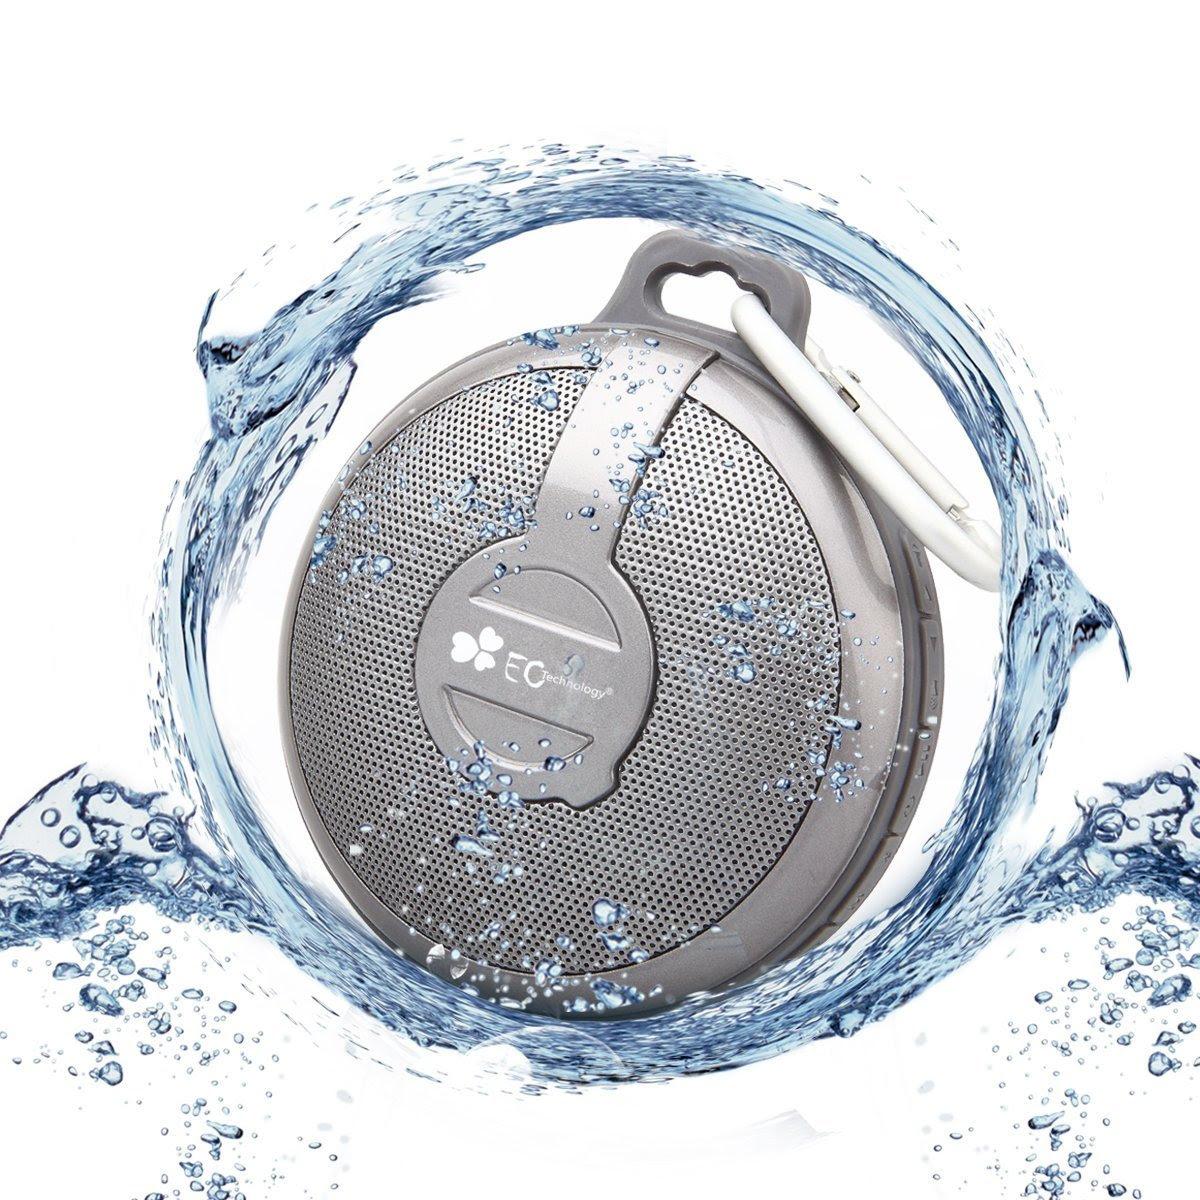 http://www.amazon.com/EC-Technology%C2%AE-Speakerphones-Waterproof-Shockproof/dp/B00KXVU2RW/ref=cm_cr-mr-img